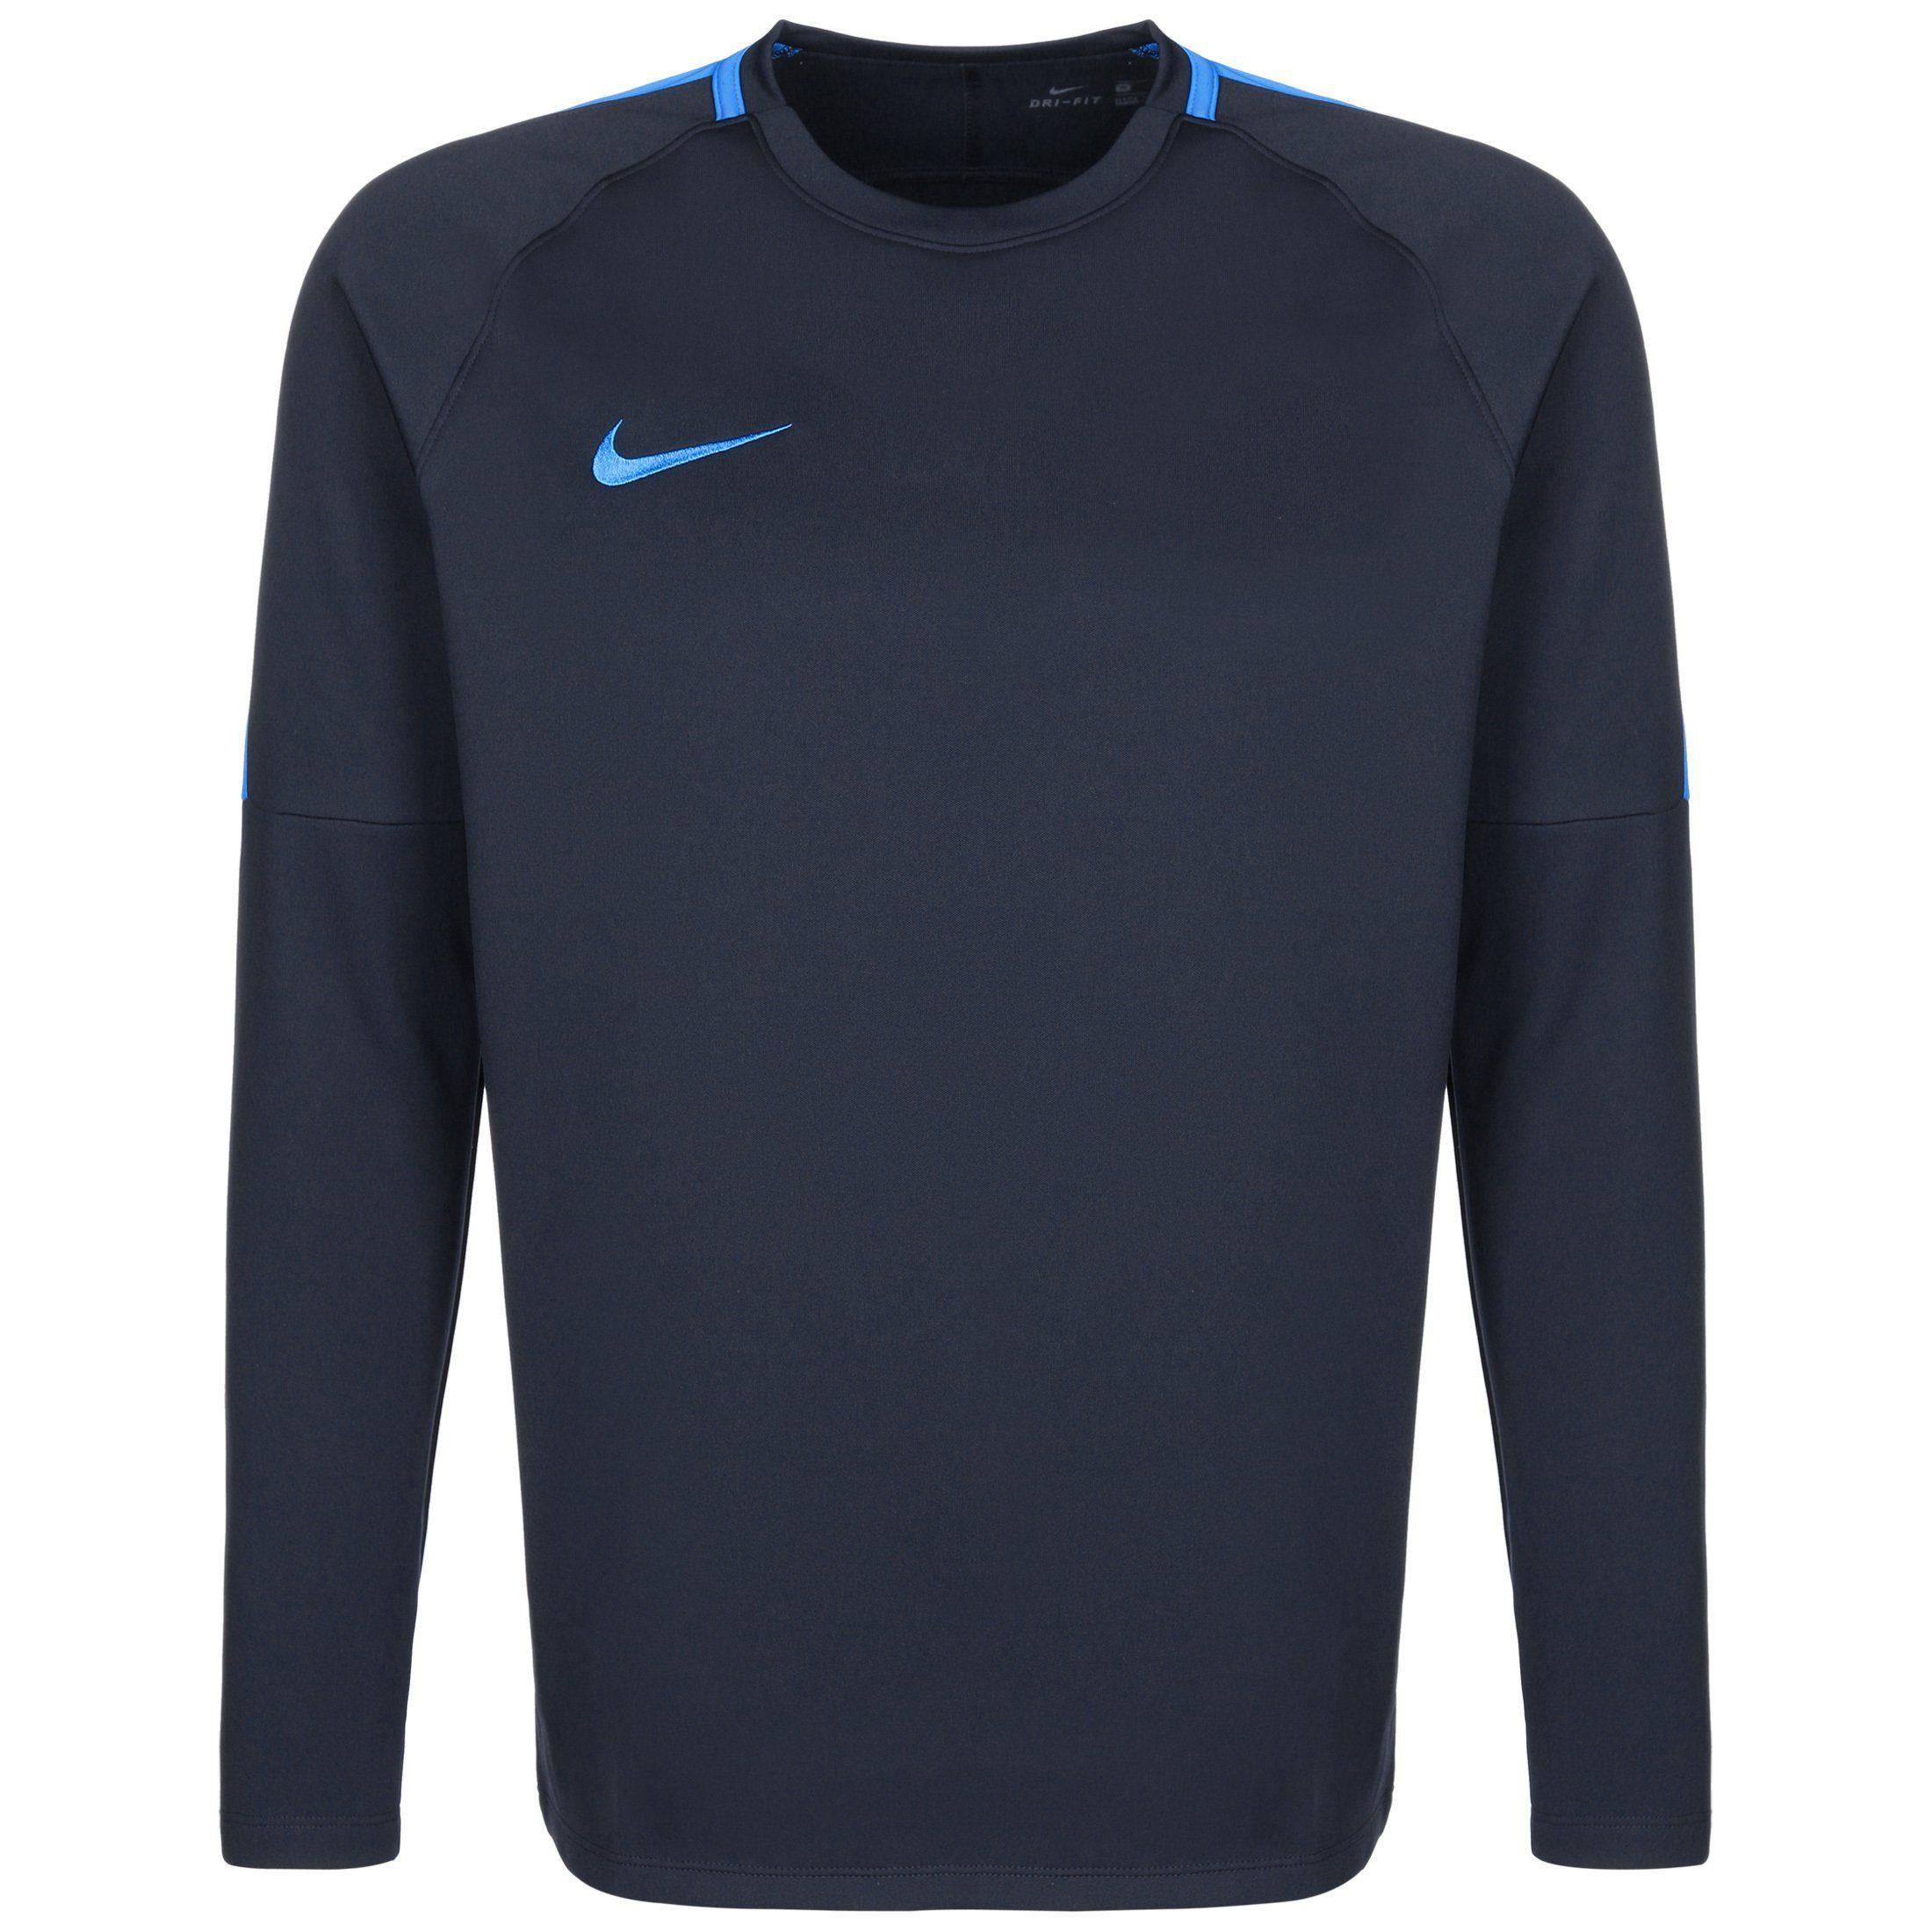 Nike Trainingsshirt Dry Academy | Sportbekleidung > Sportshirts > Funktionsshirts | Nike